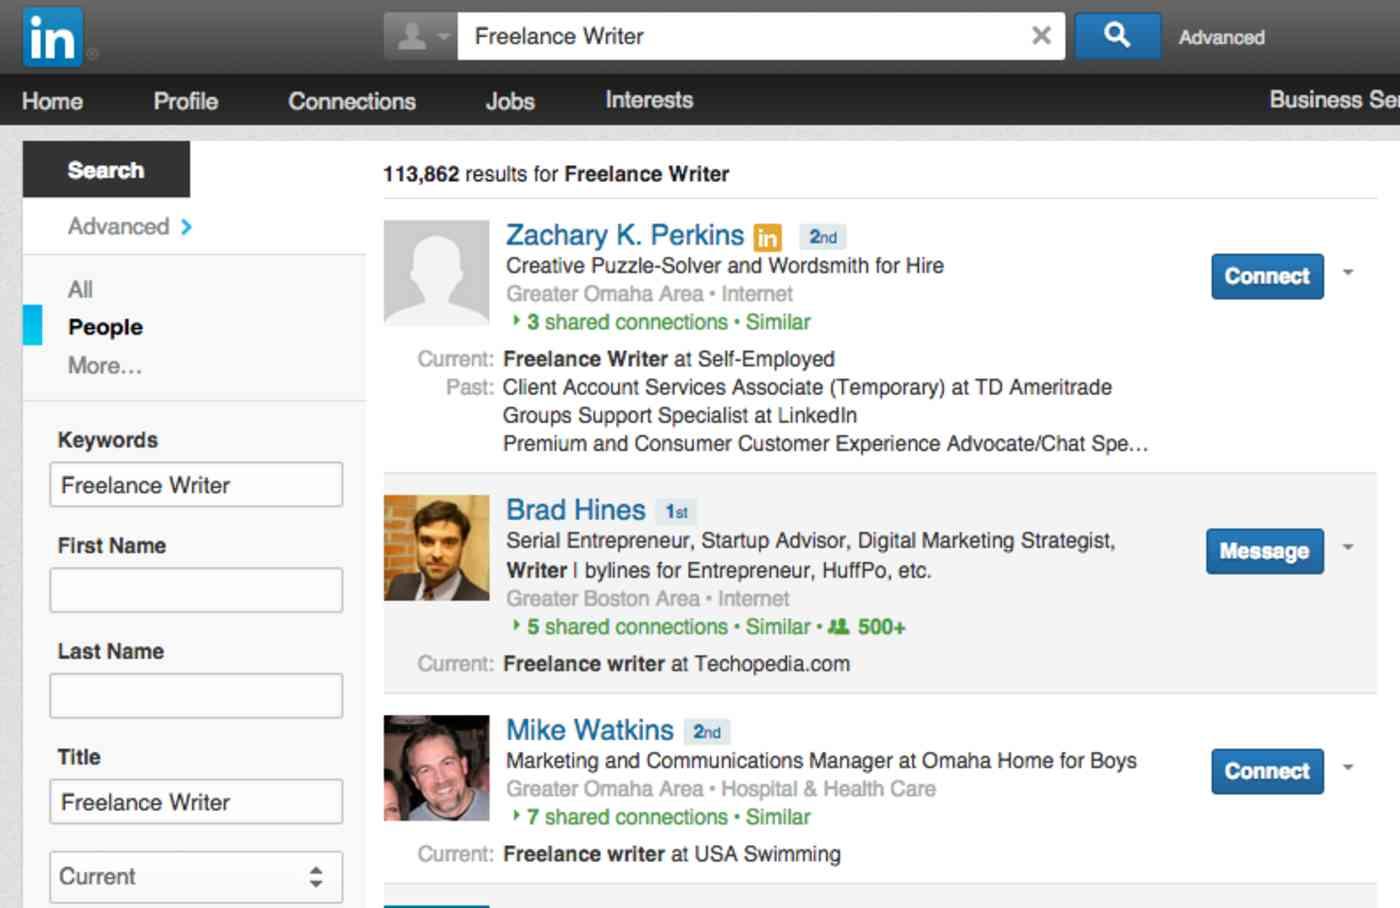 LinkedIn freelance writer search